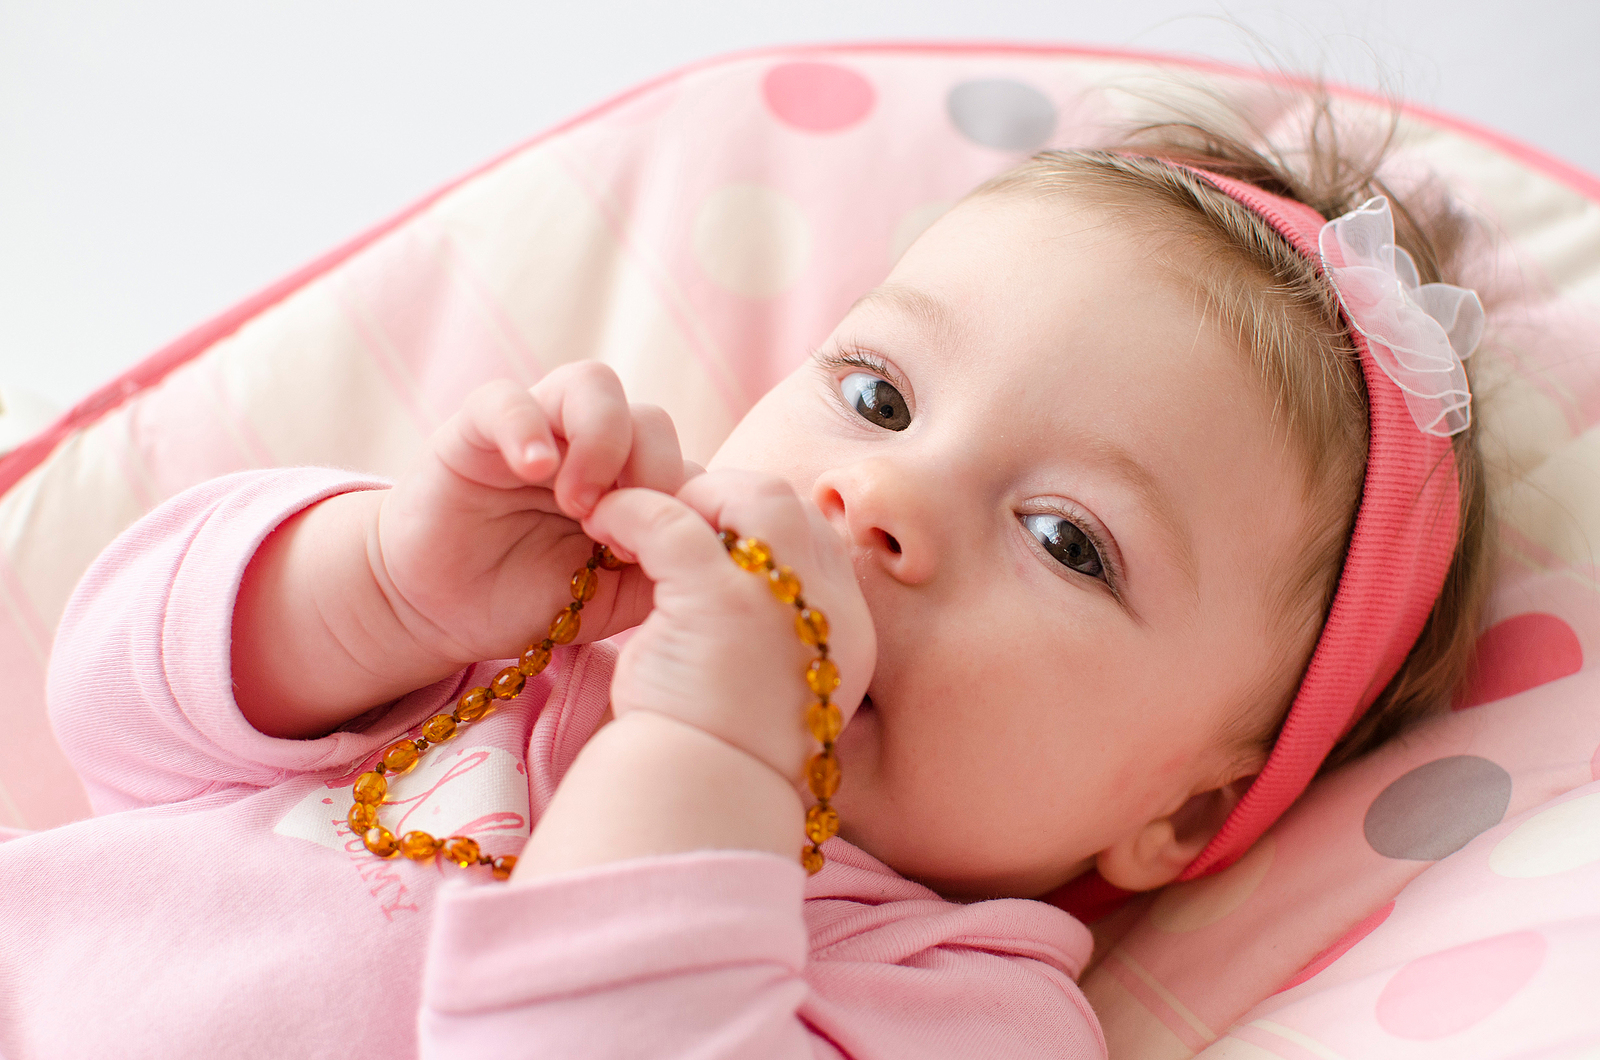 Amber Teething Necklaces May Pose Strangulation Risk